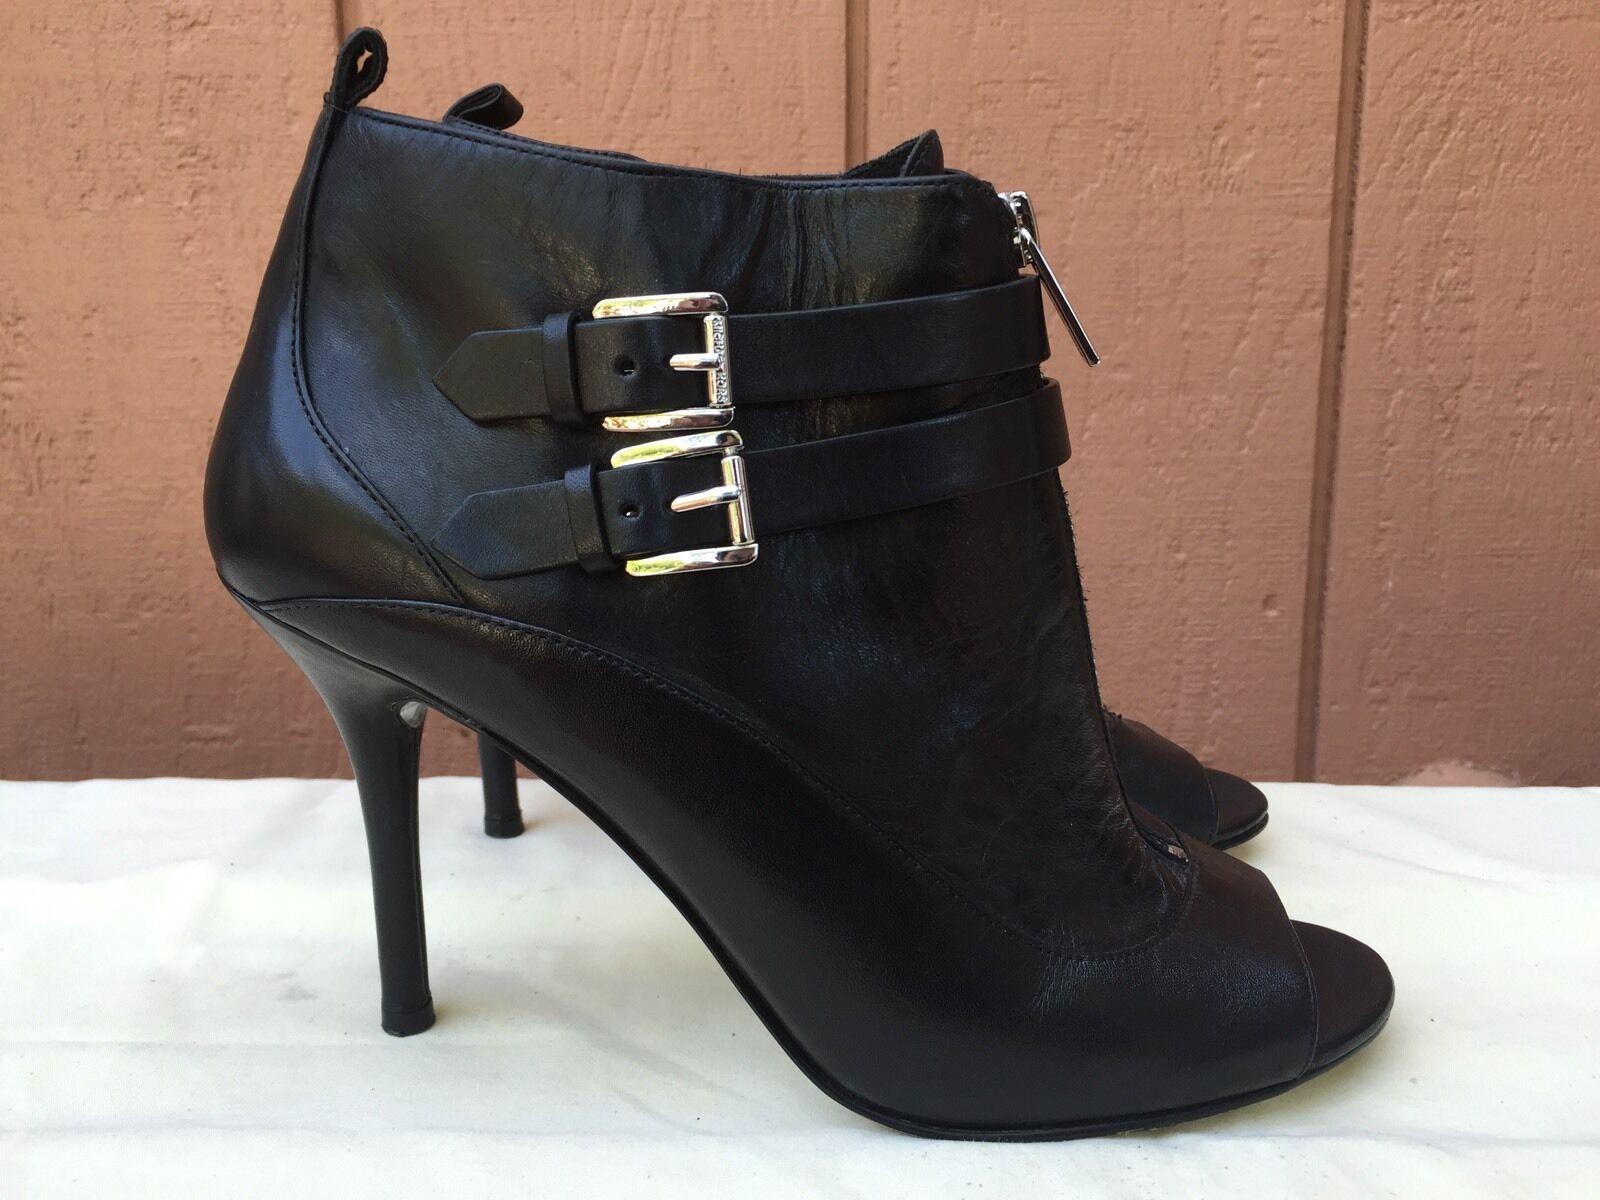 Michael Kors Black Leather Open Toe Ankle Boot Bootie Sandal Heels Pump US 9.5 M